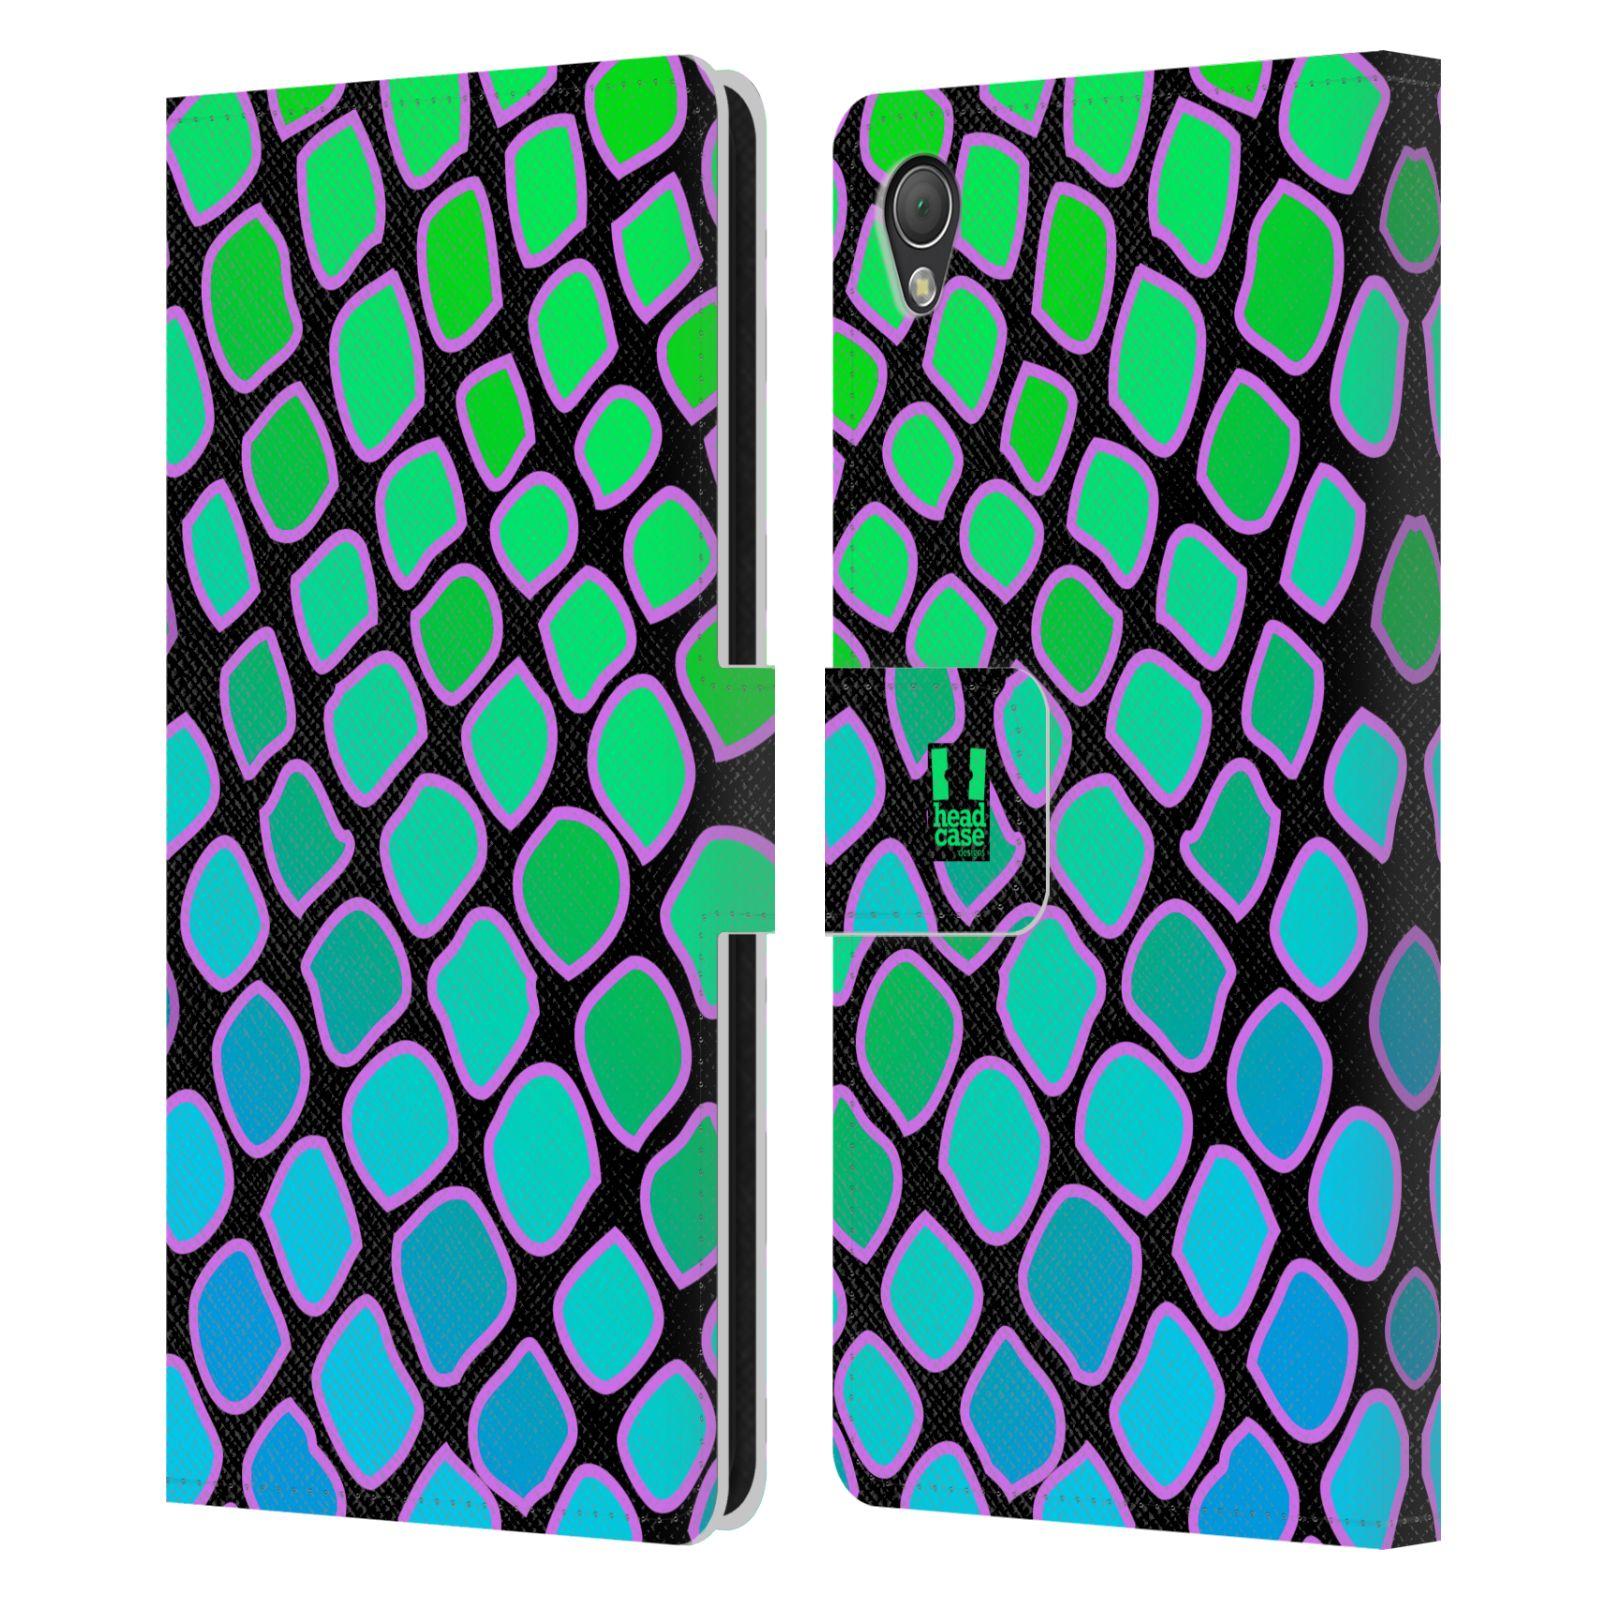 HEAD CASE Flipové pouzdro pro mobil SONY XPERIA Z3 Zvířecí barevné vzory vodní had modrá a zelená barva AQUA